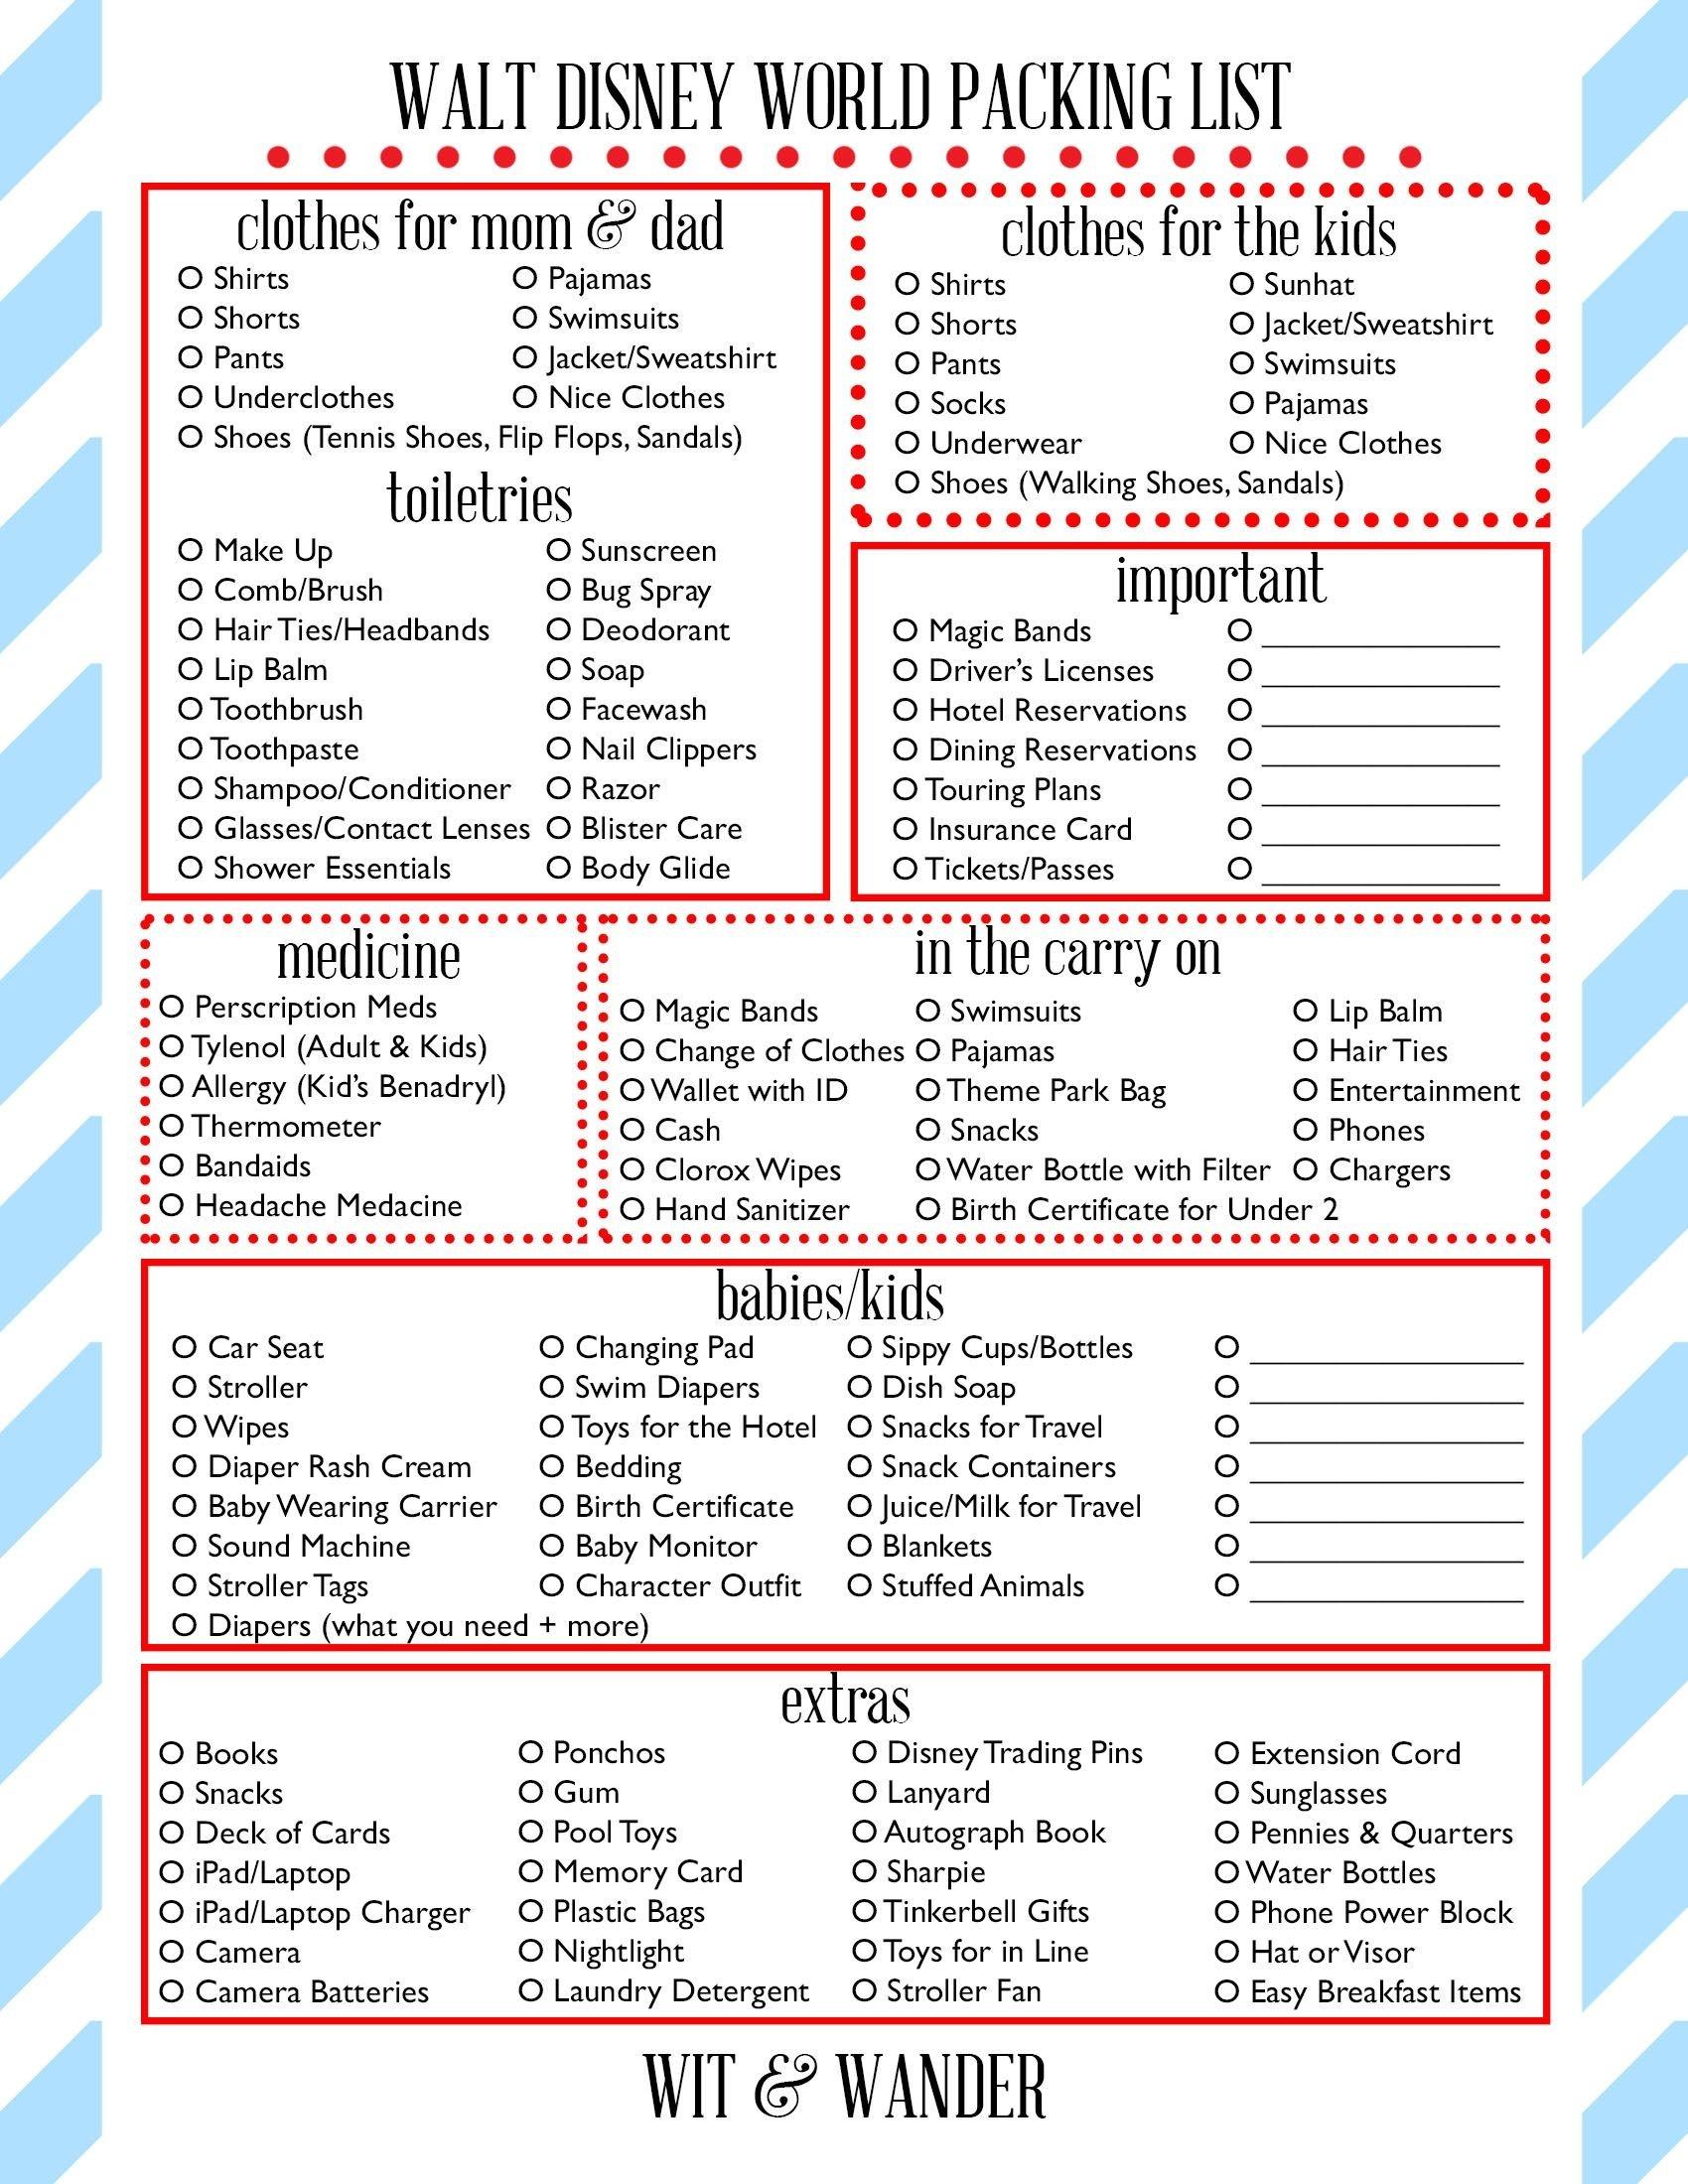 Walt Disney World Free Printables | Disney World Packing-Disney World Word Document Template